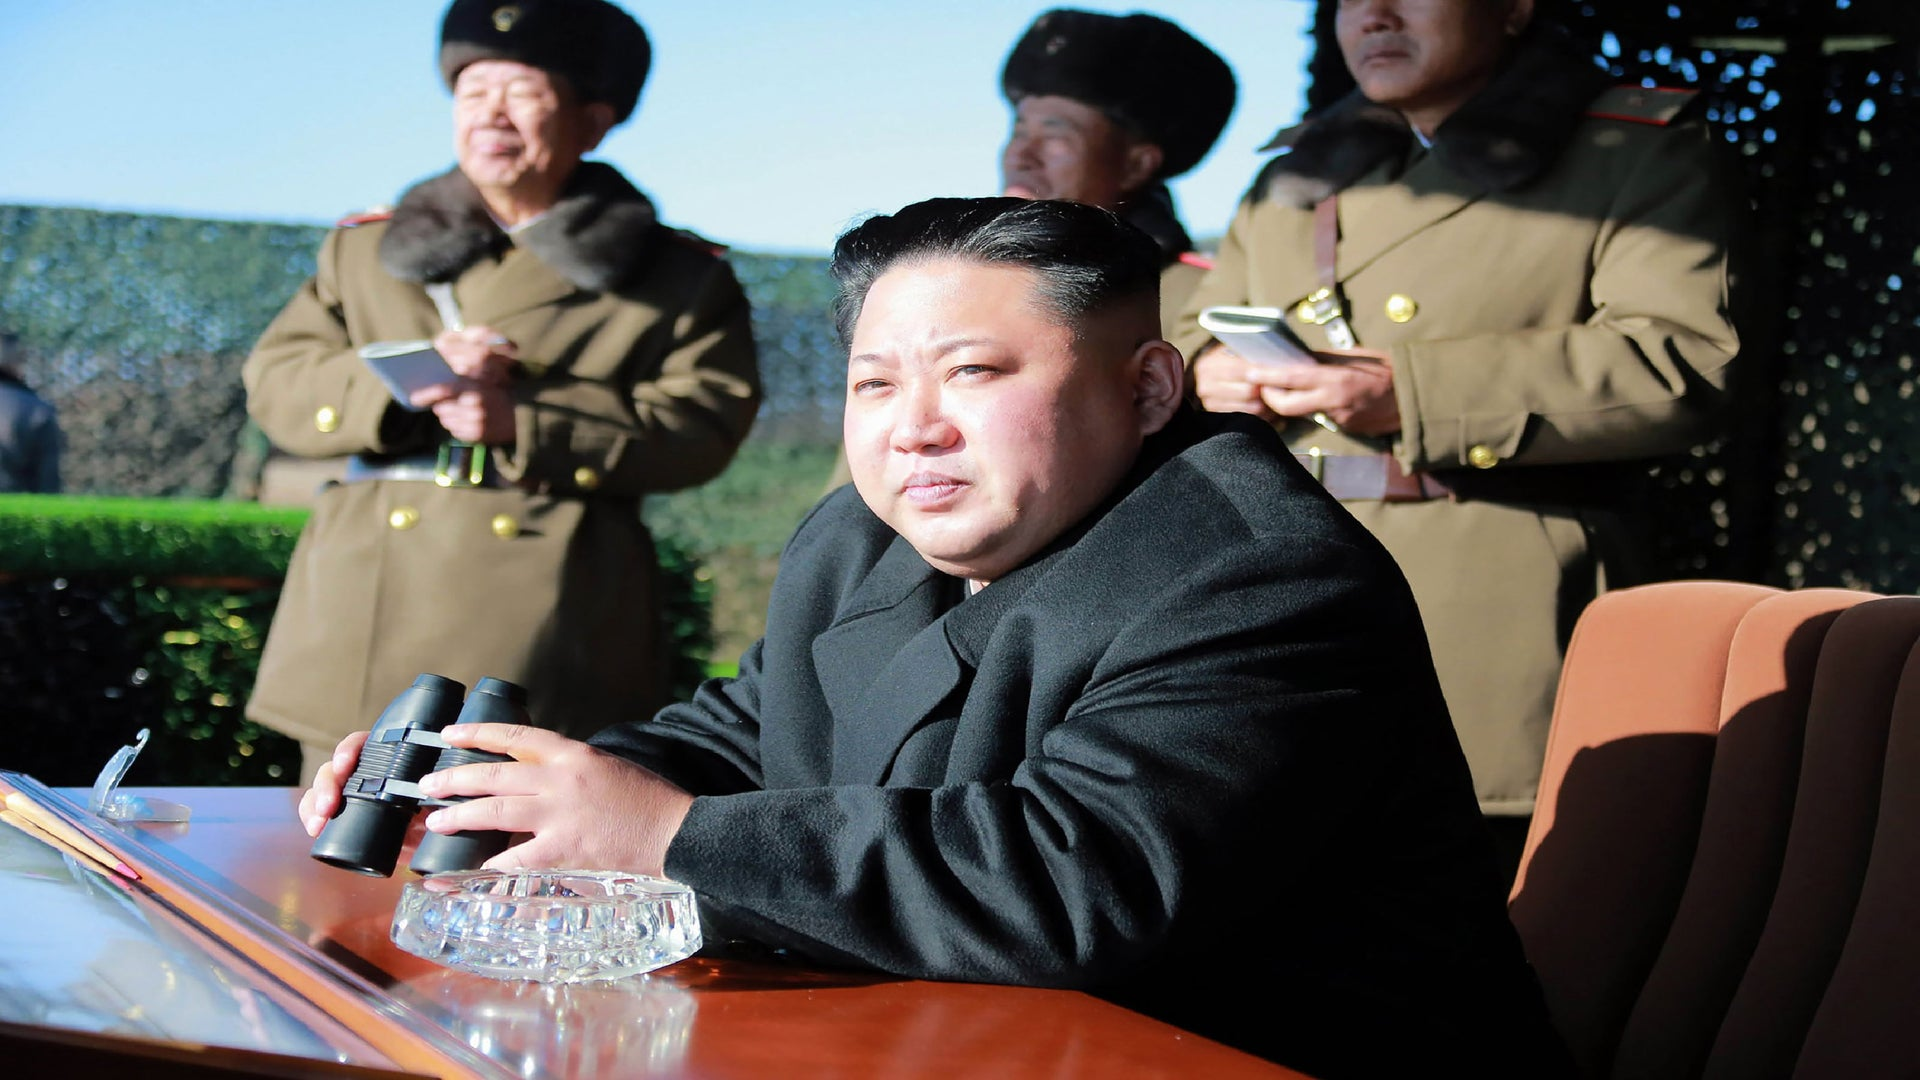 North Korea Calls President Trump's 'Fire And Fury' Threat A 'Load Of Nonsense'